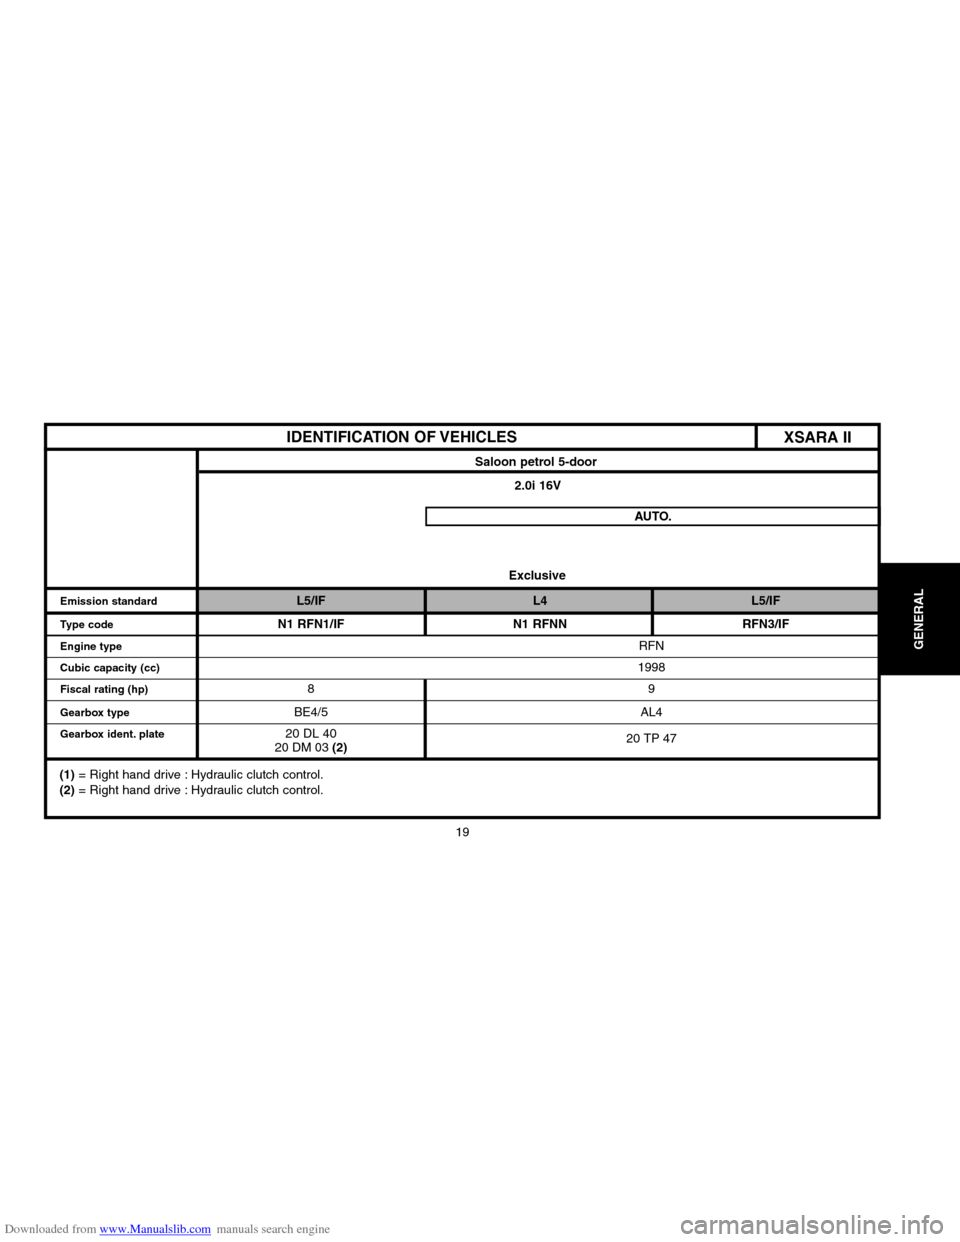 Citroen C2 2004 1g Workshop Manual Download Fuse Box Diagram